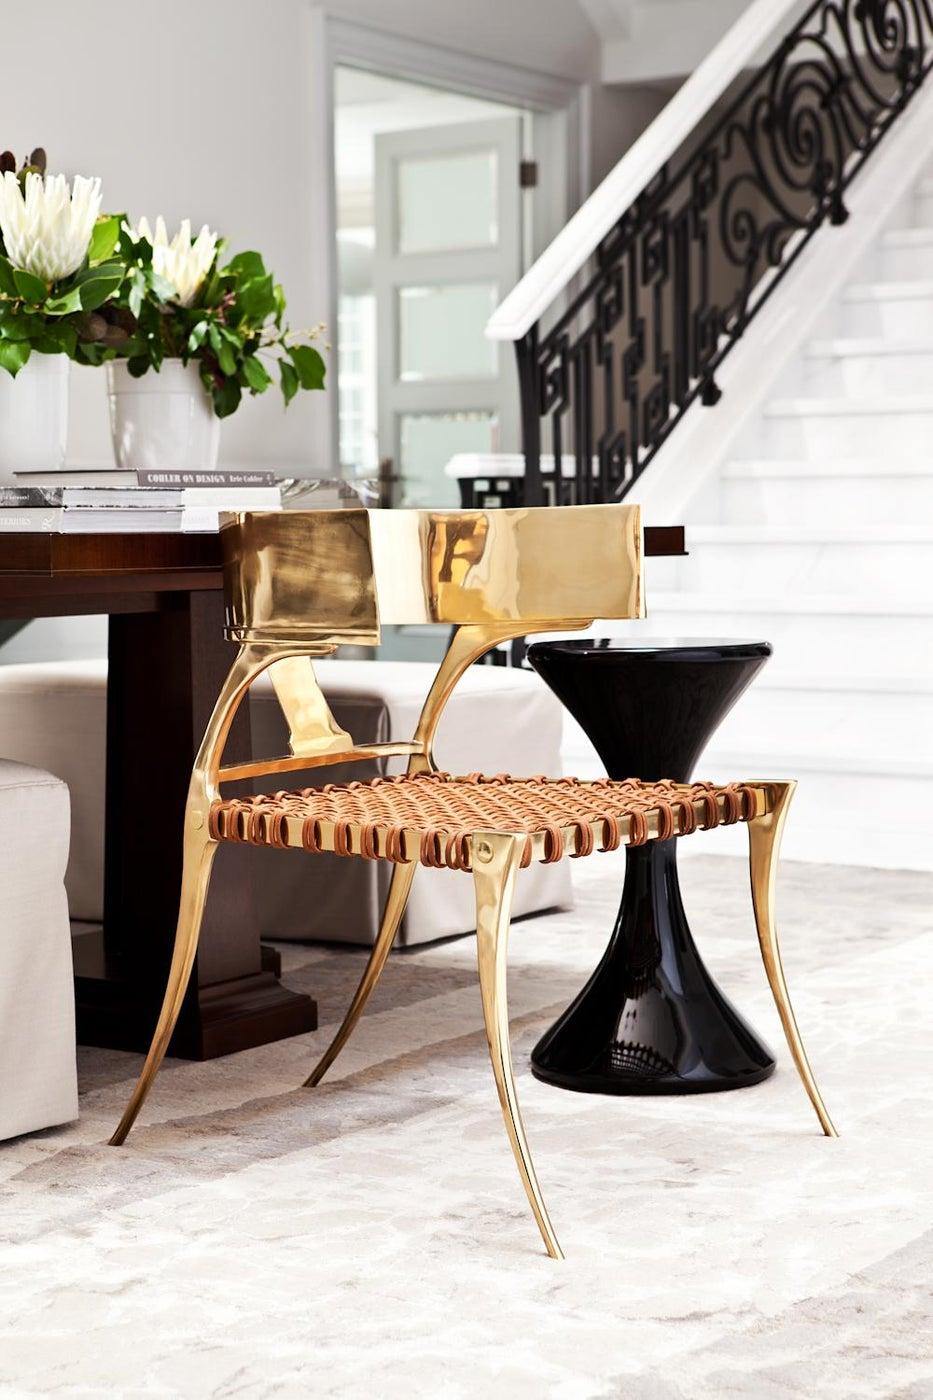 Klisomos Chair in the Stair Hall designed by Elizabeth Metcalfe Interiors & Design Inc.